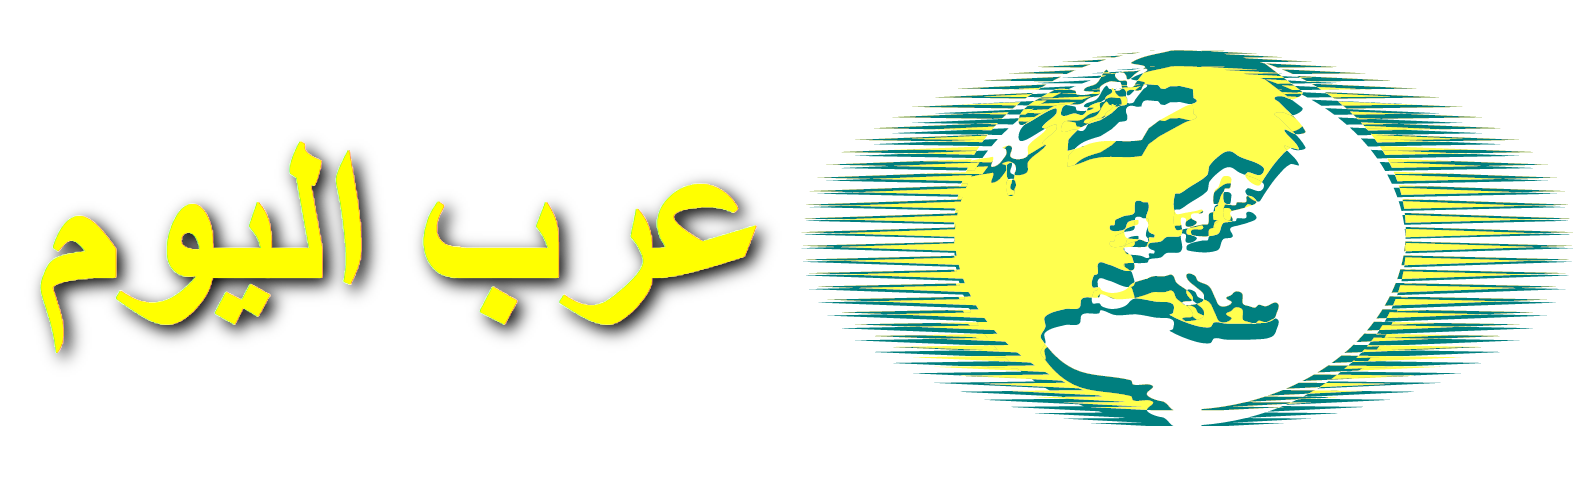 Arab - Today